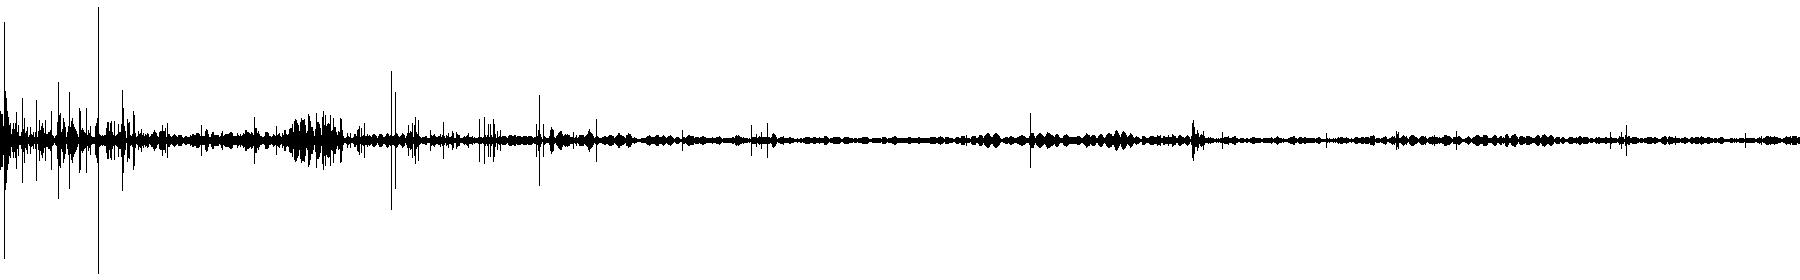 chia vinyl crackle sample 1